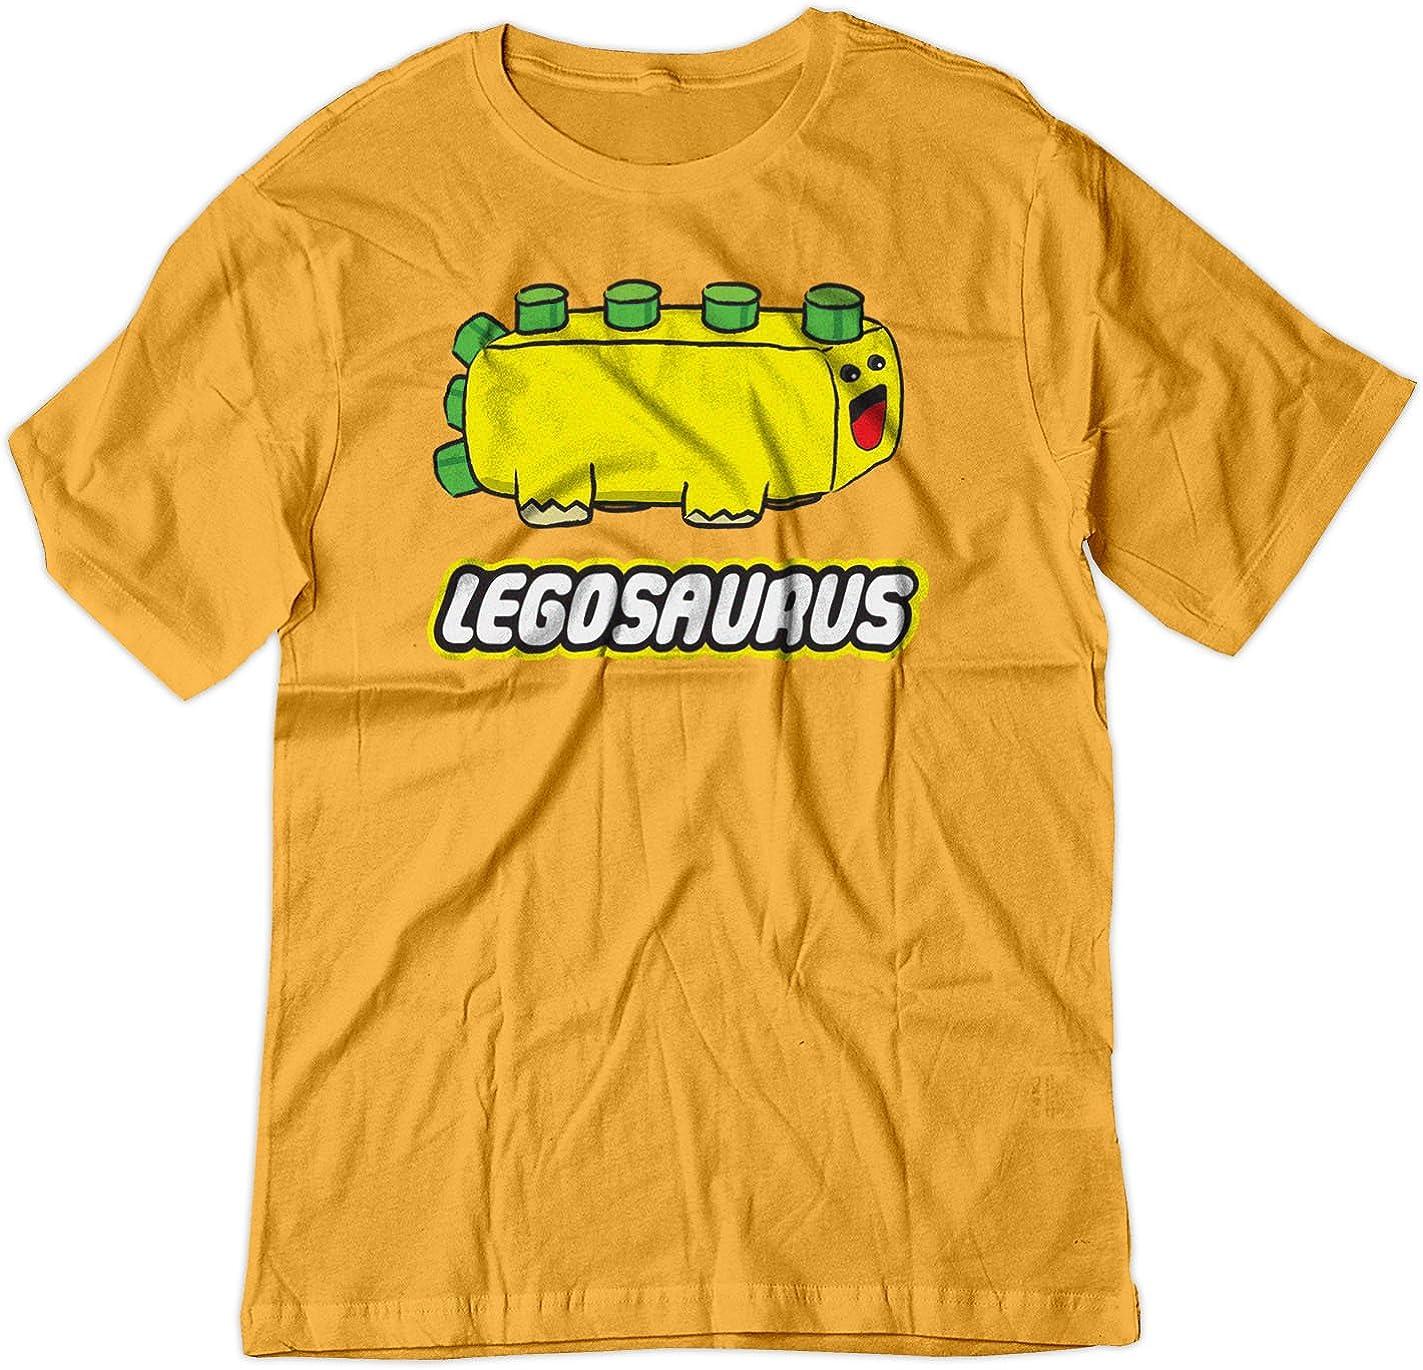 BSW Youth Legosaurus Lego Cute Dinosaur Block Shirt